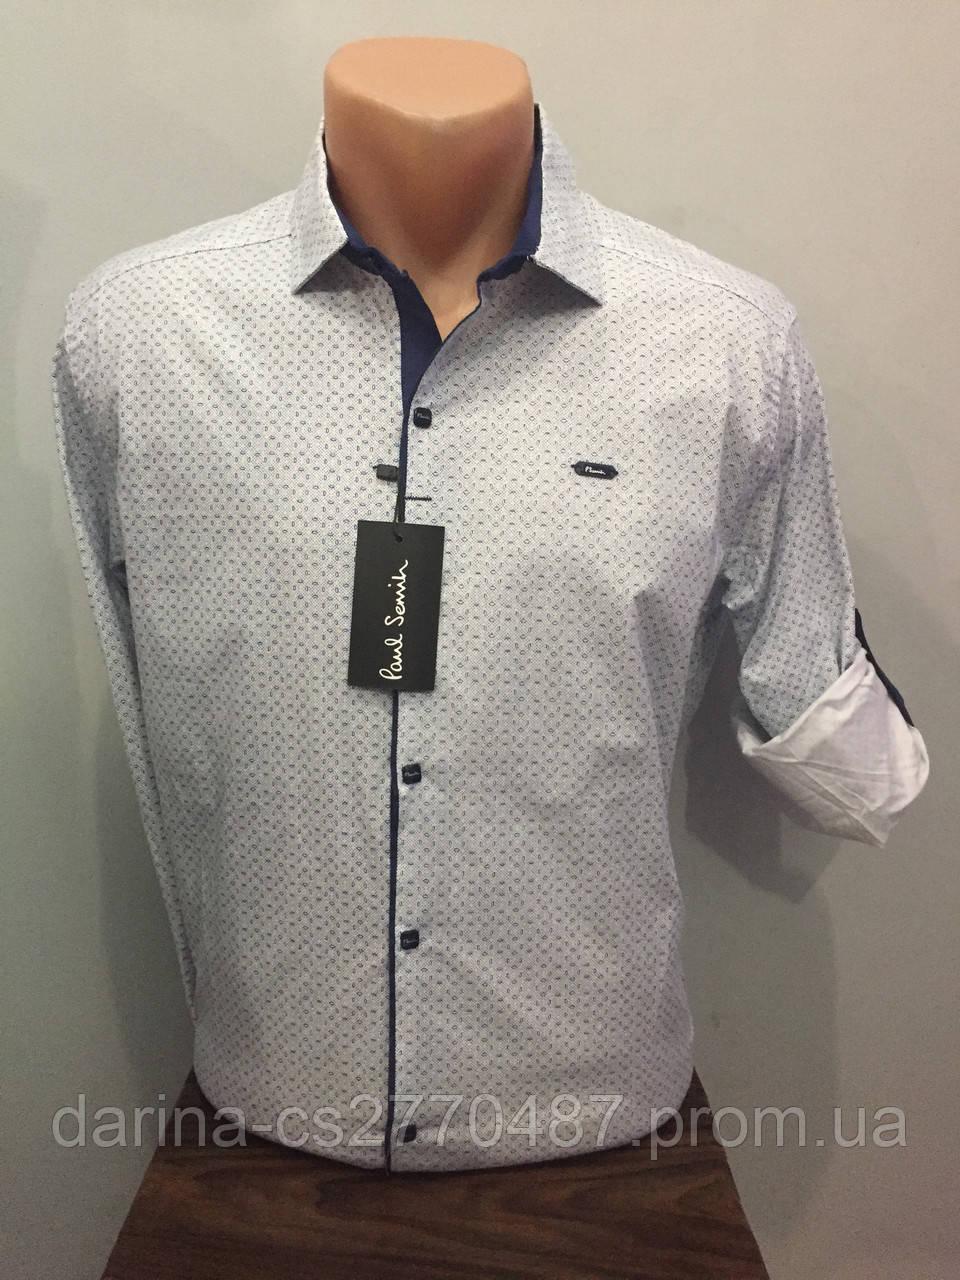 Турецкая мужская рубашка на кнопках S-2XL